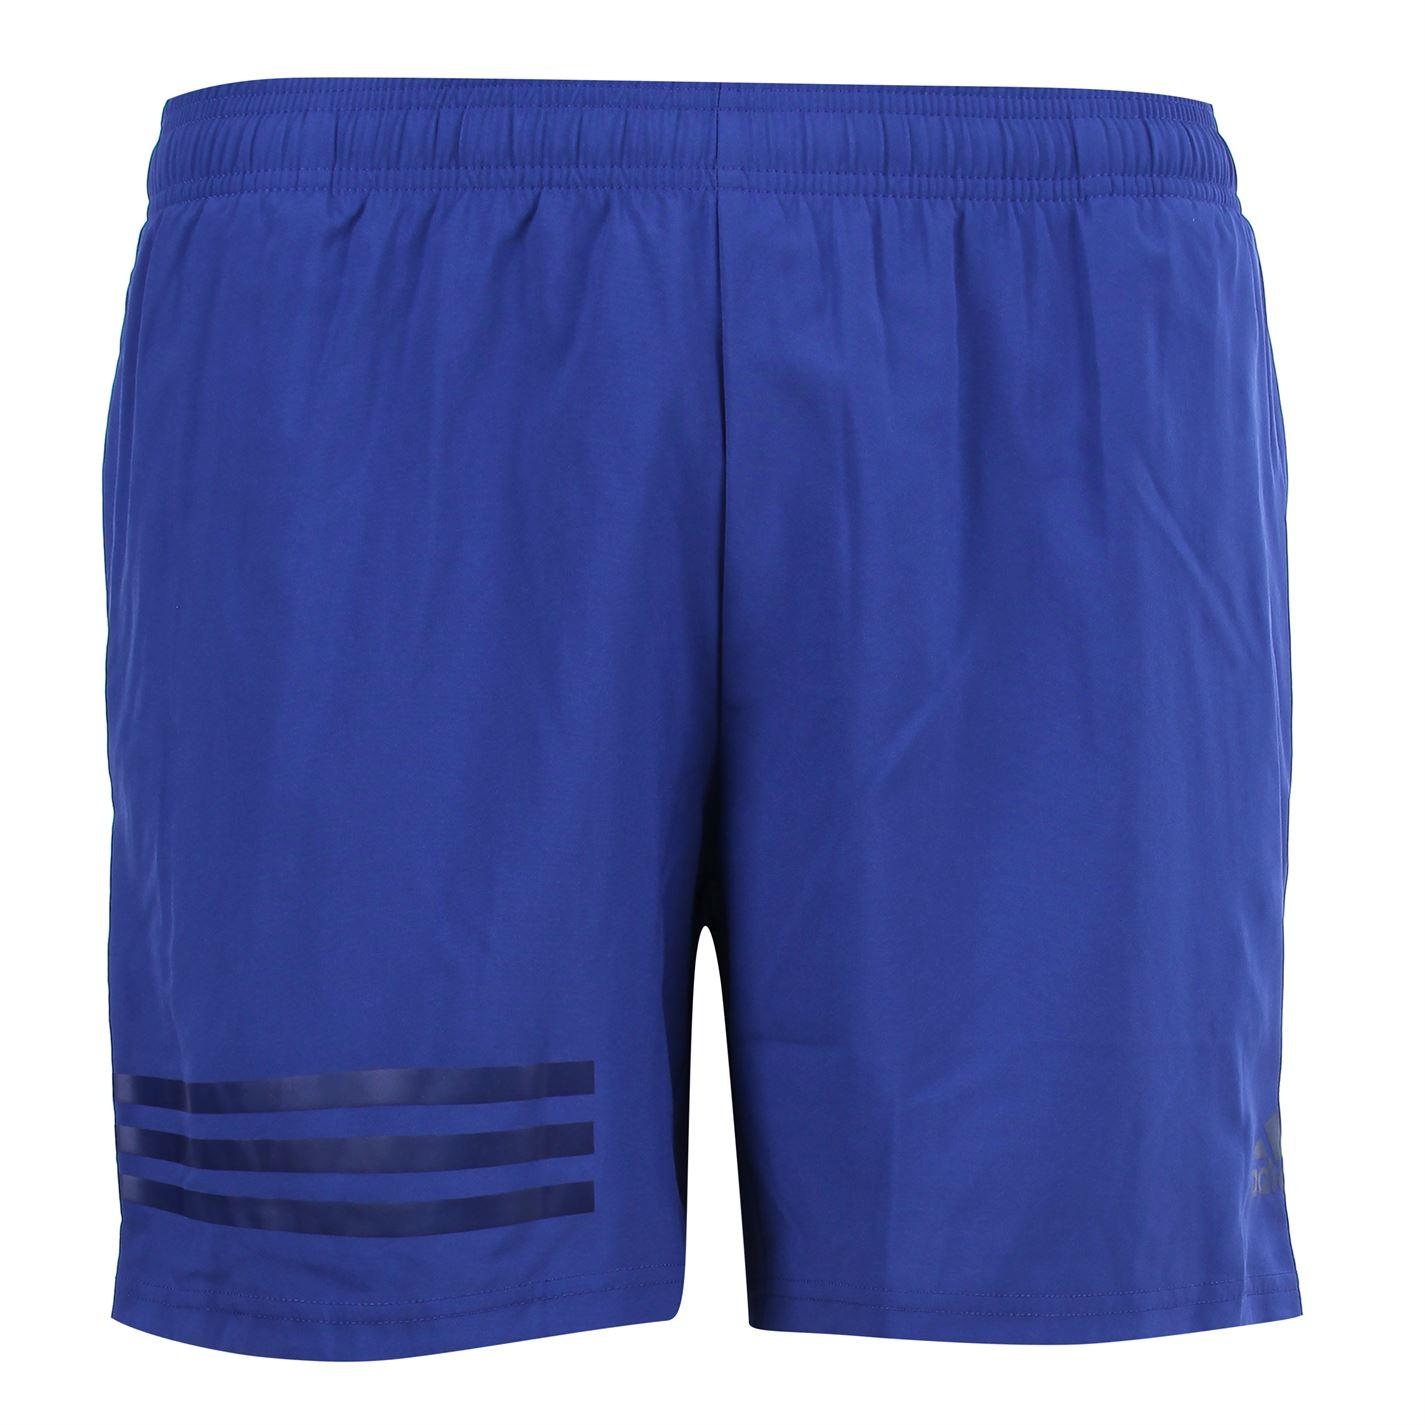 Adidas 4KRFT Climacool Men's Shorts